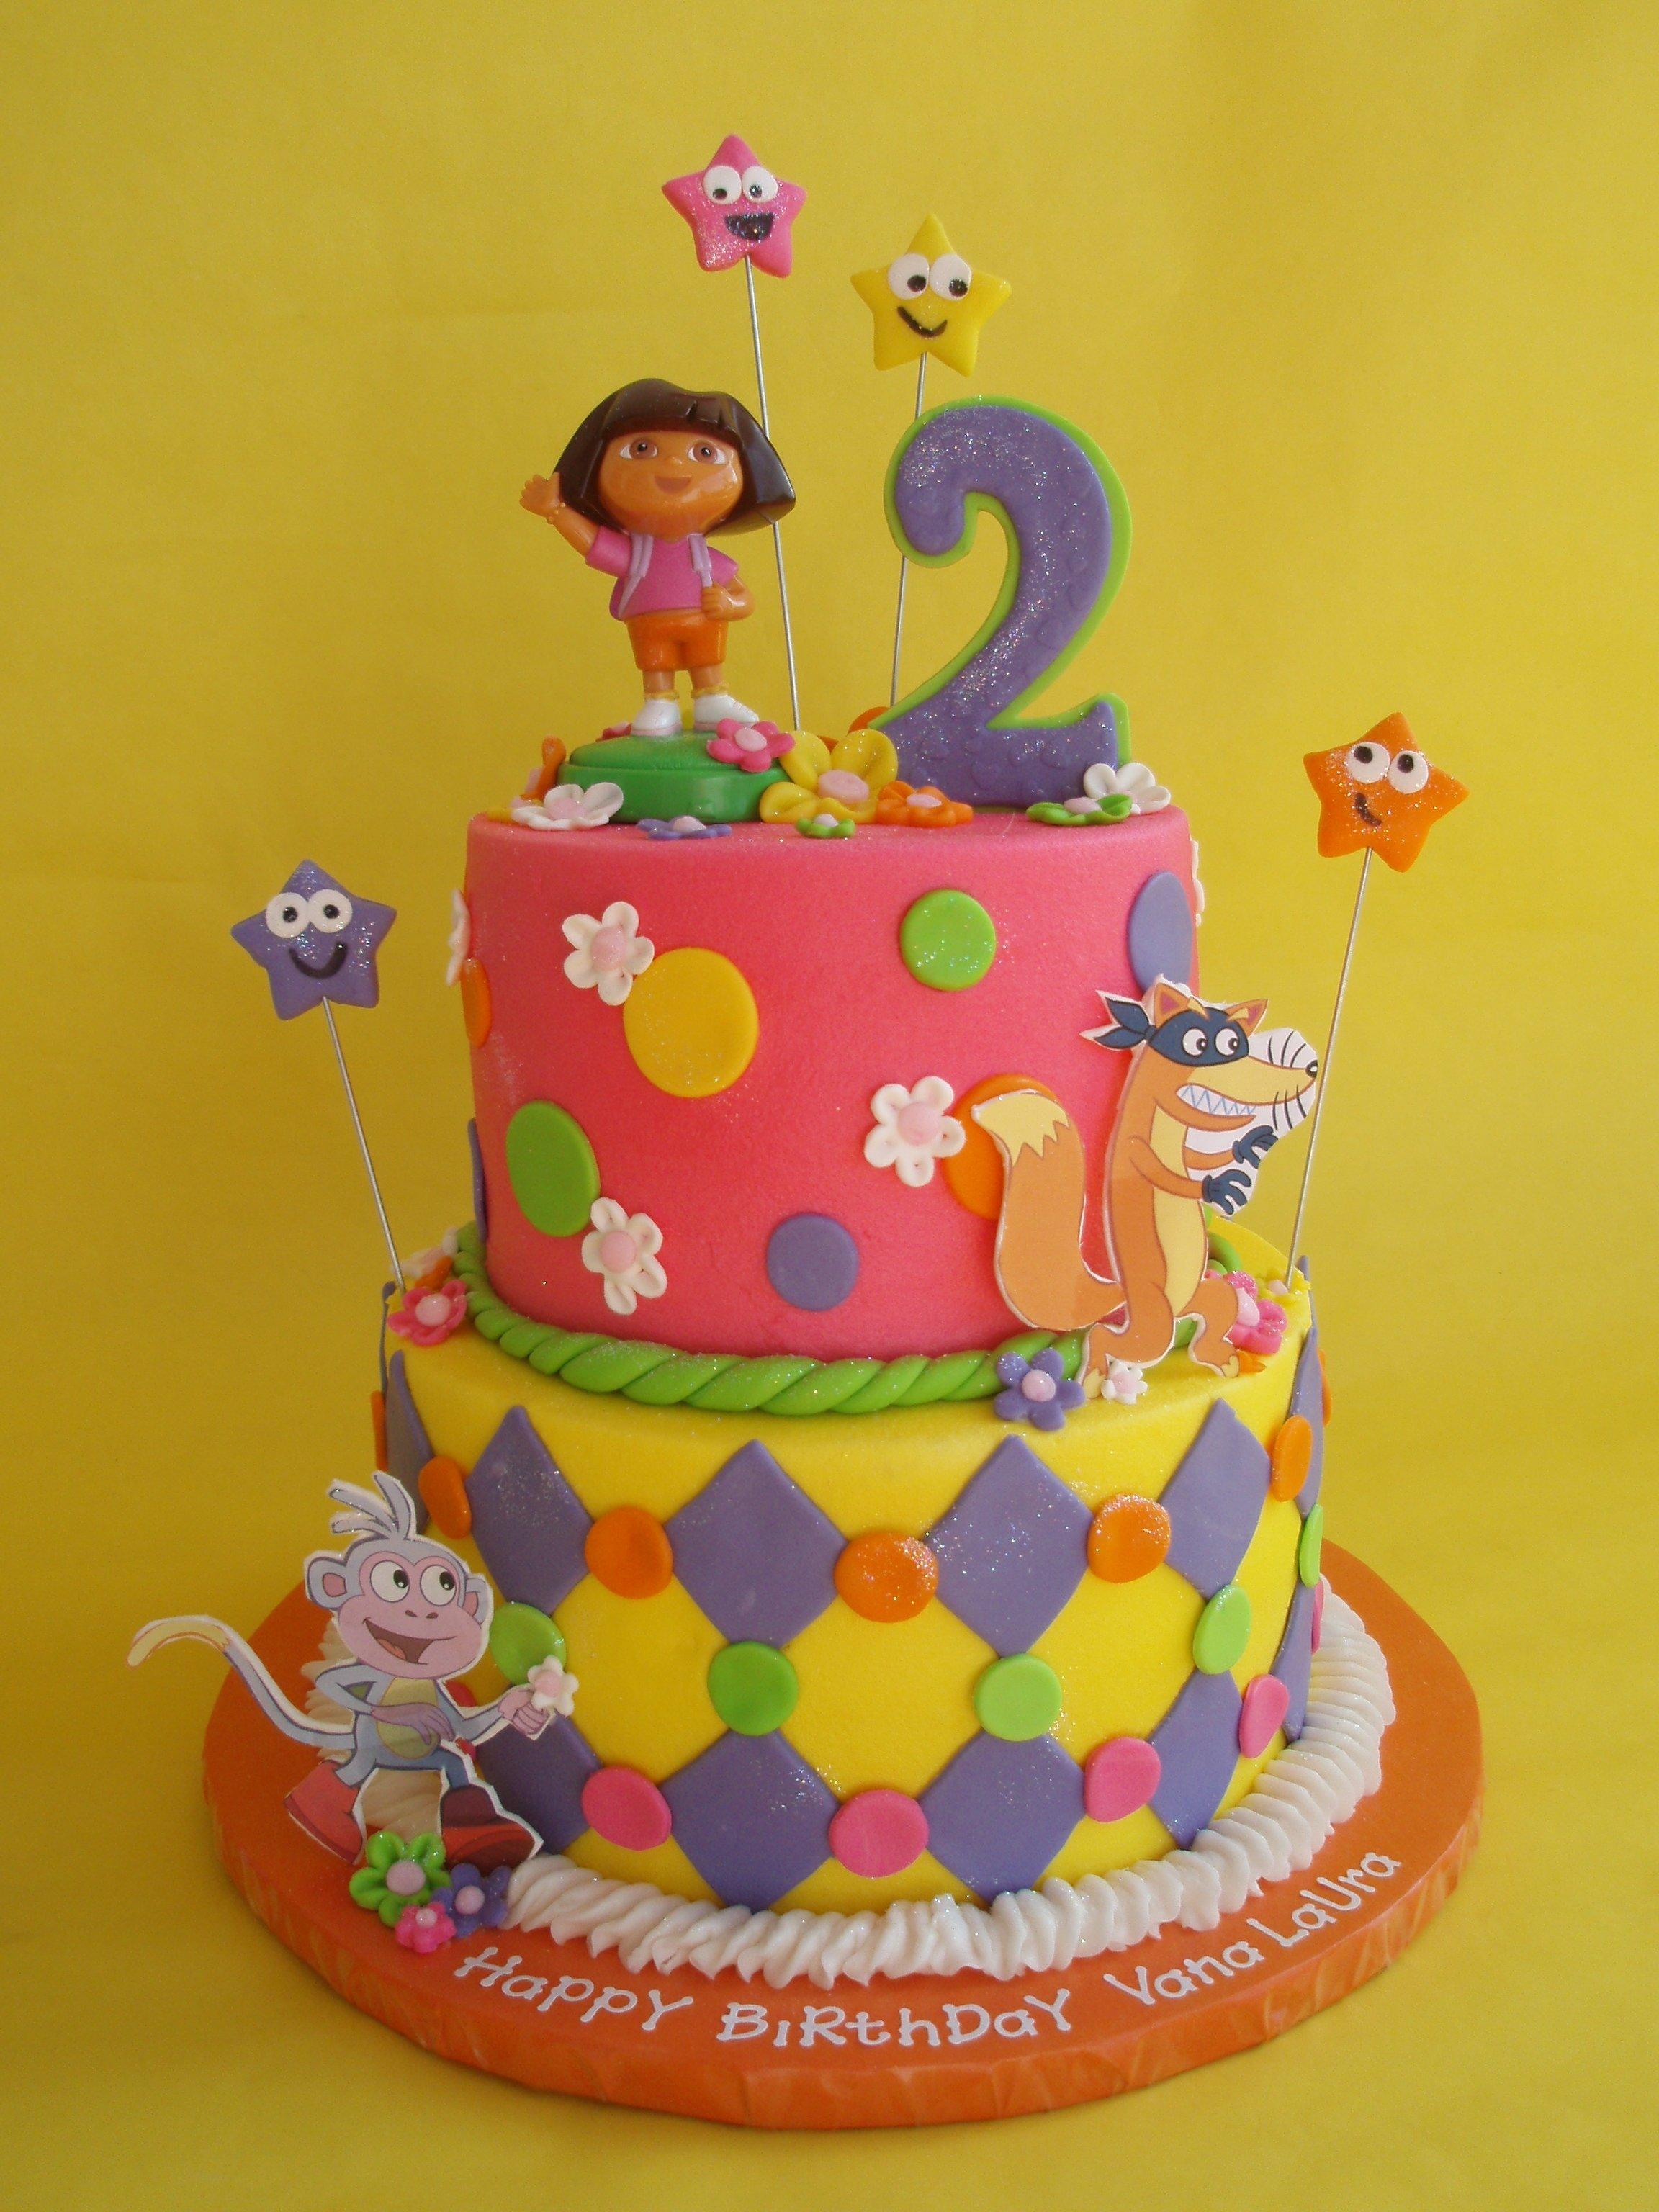 10 Awesome Dora The Explorer Cake Ideas dora cakes decoration ideas little birthday cakes 2021